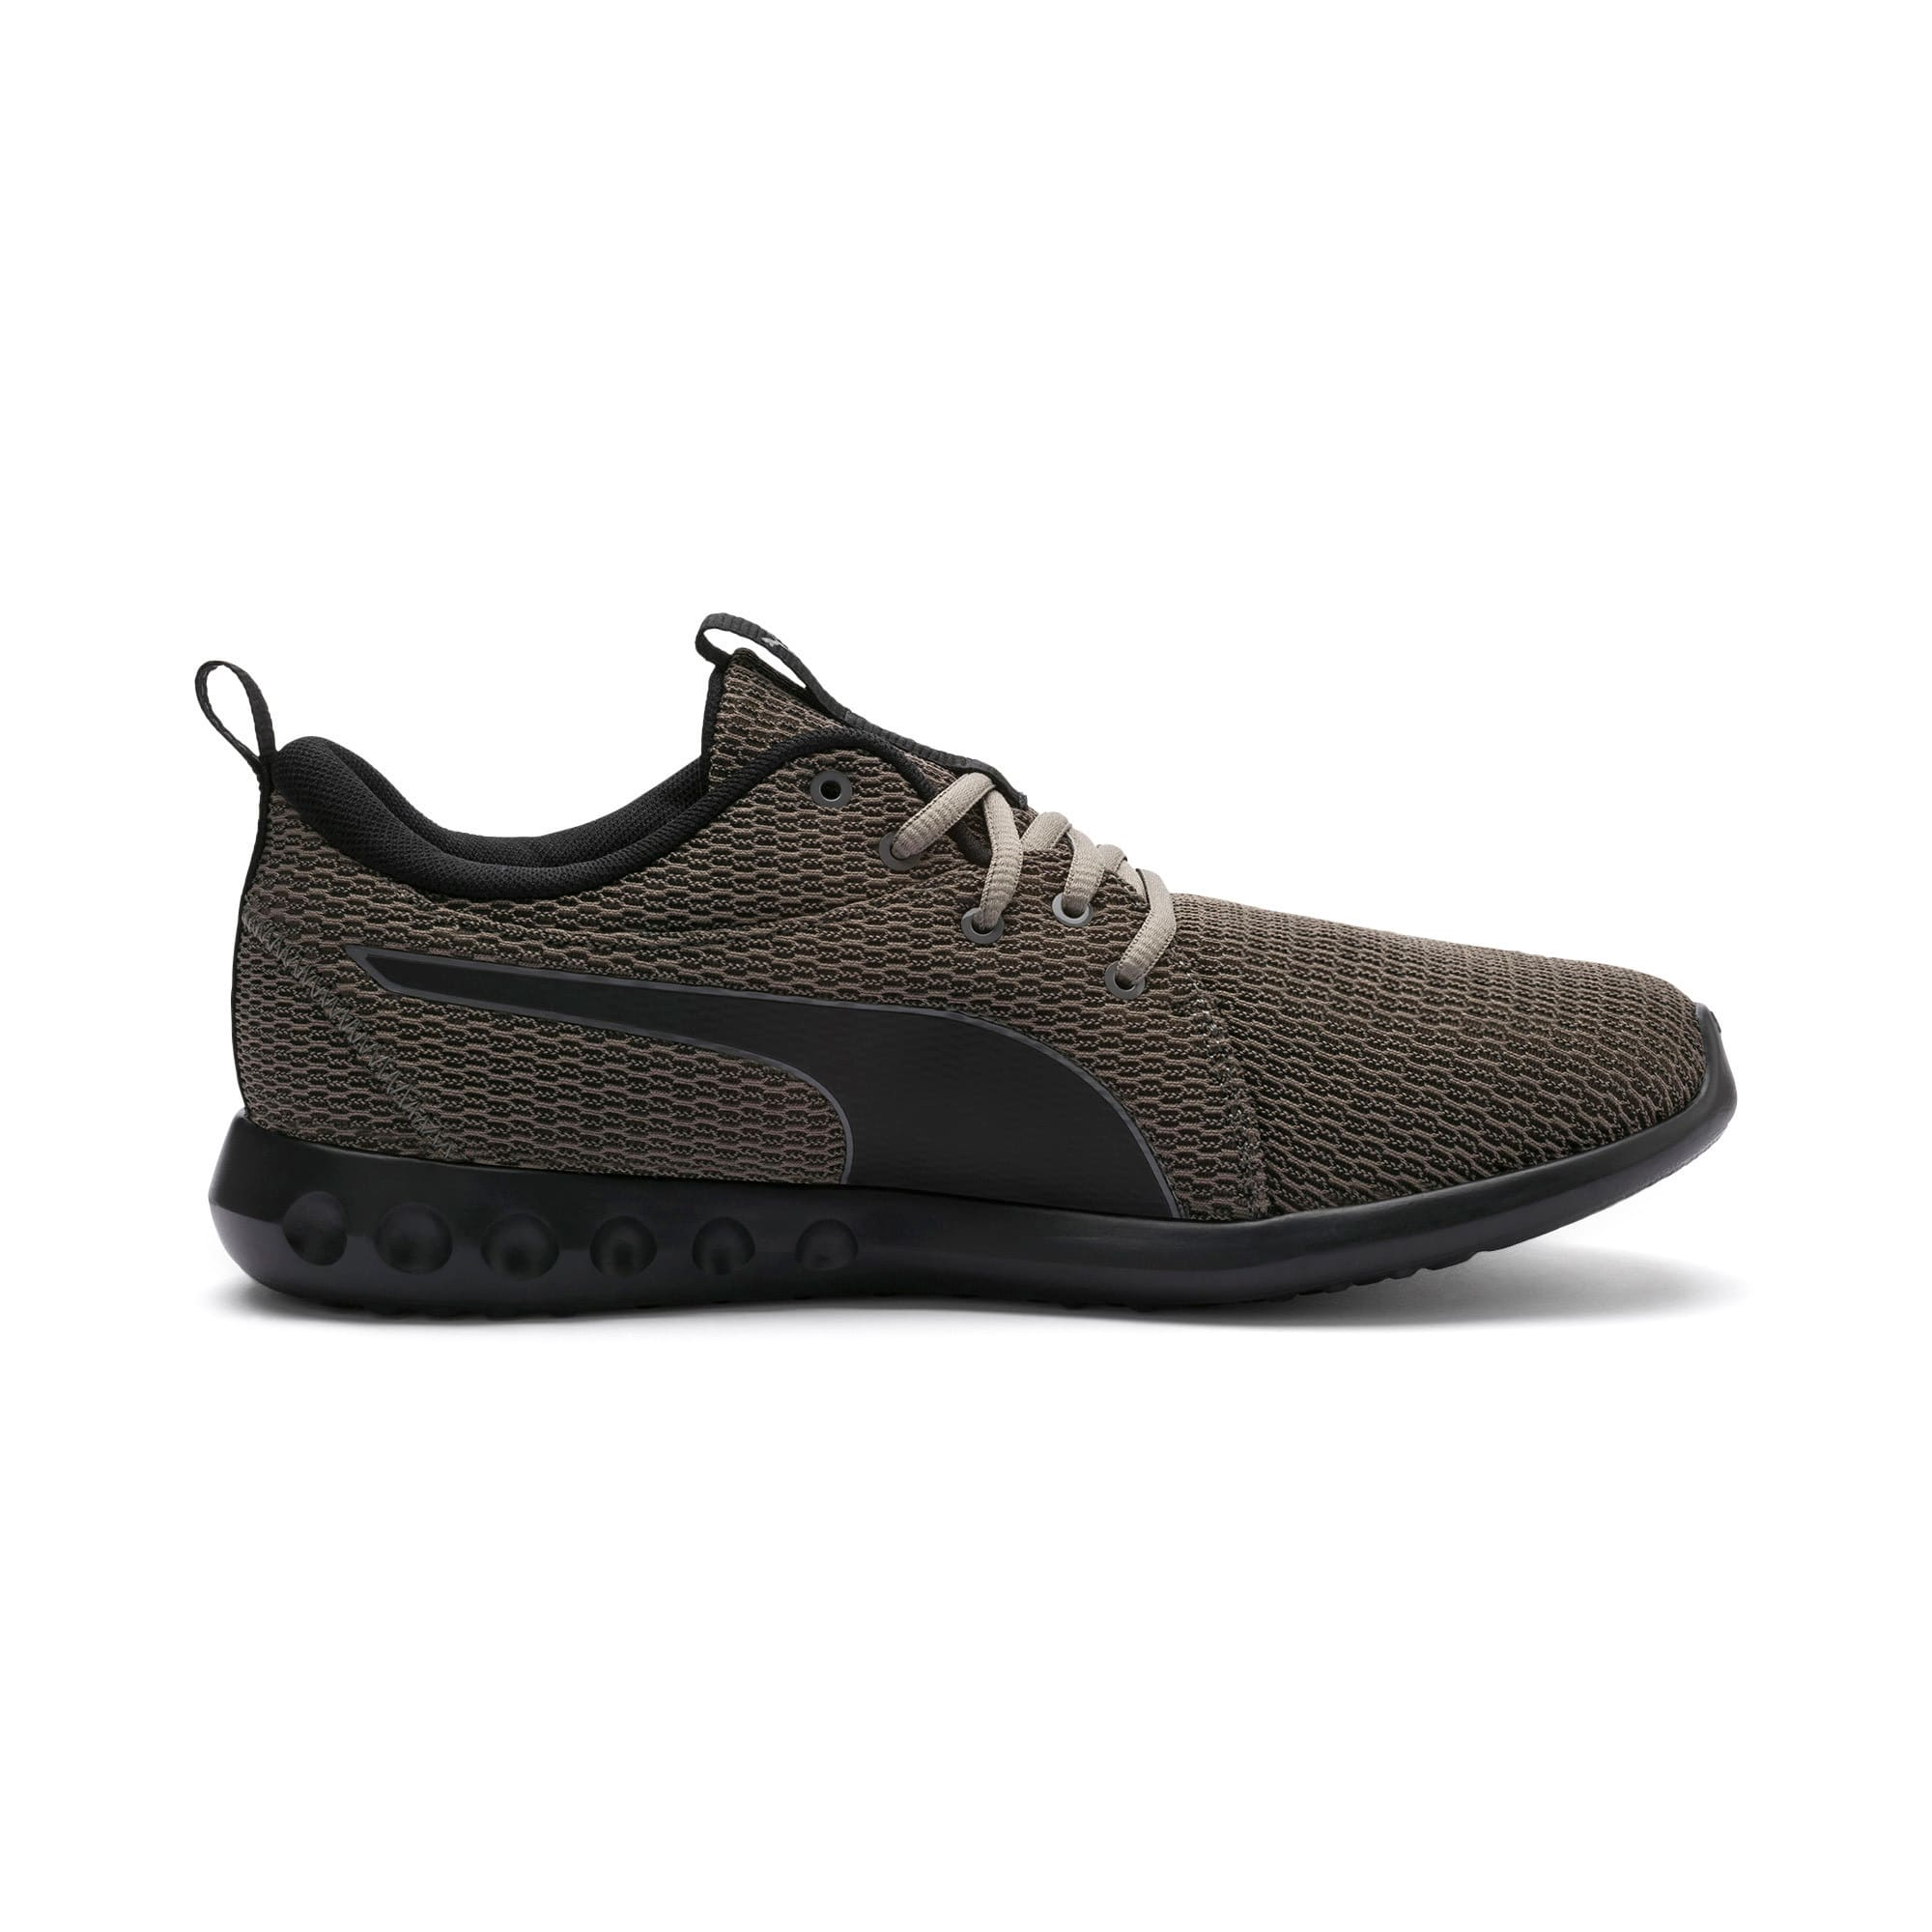 Miniatura 5 de Zapatos para correrCarson 2 New Corepara hombre, Charcoal Gray-Puma Black, mediano